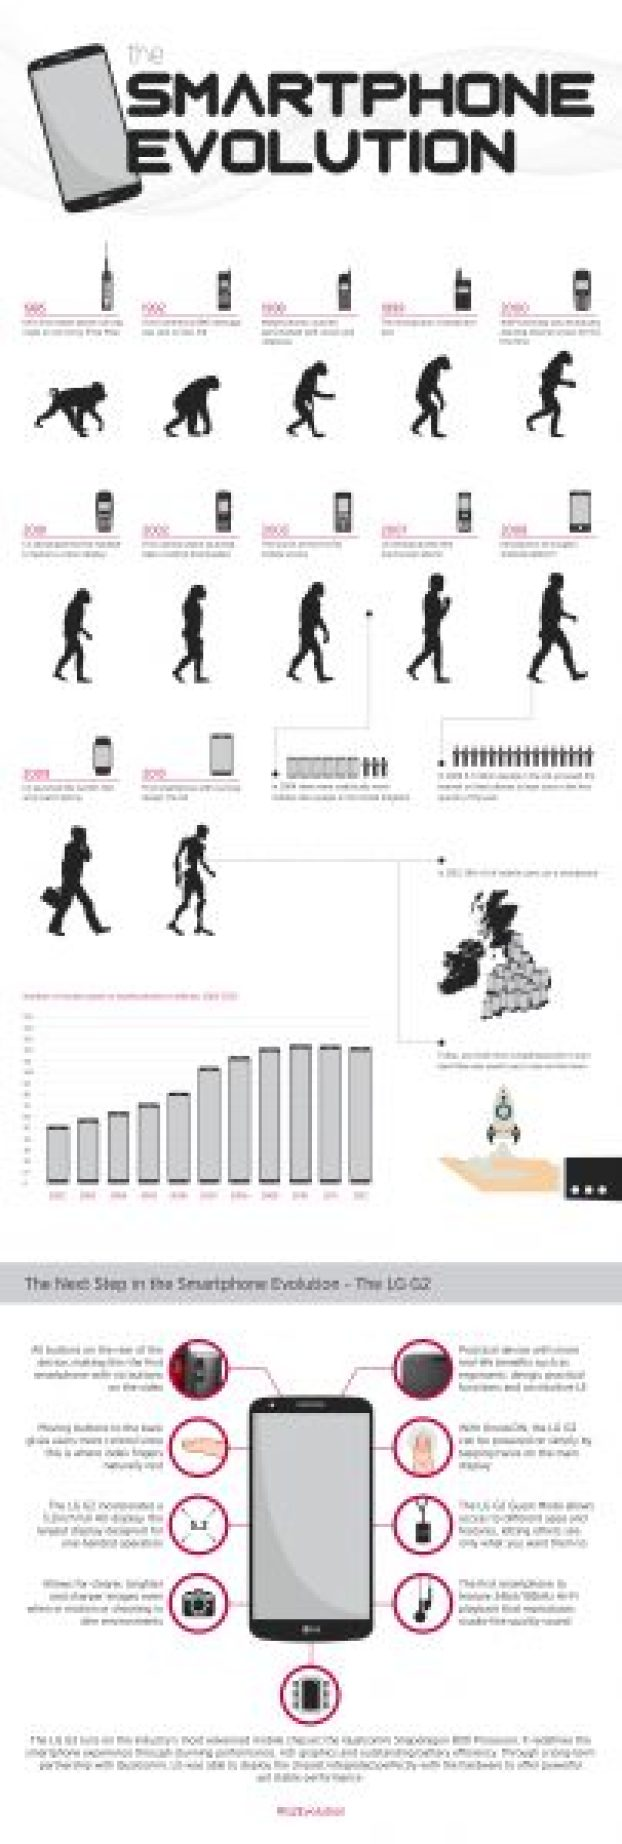 LG SMARTPHONE EVOLUTION V7